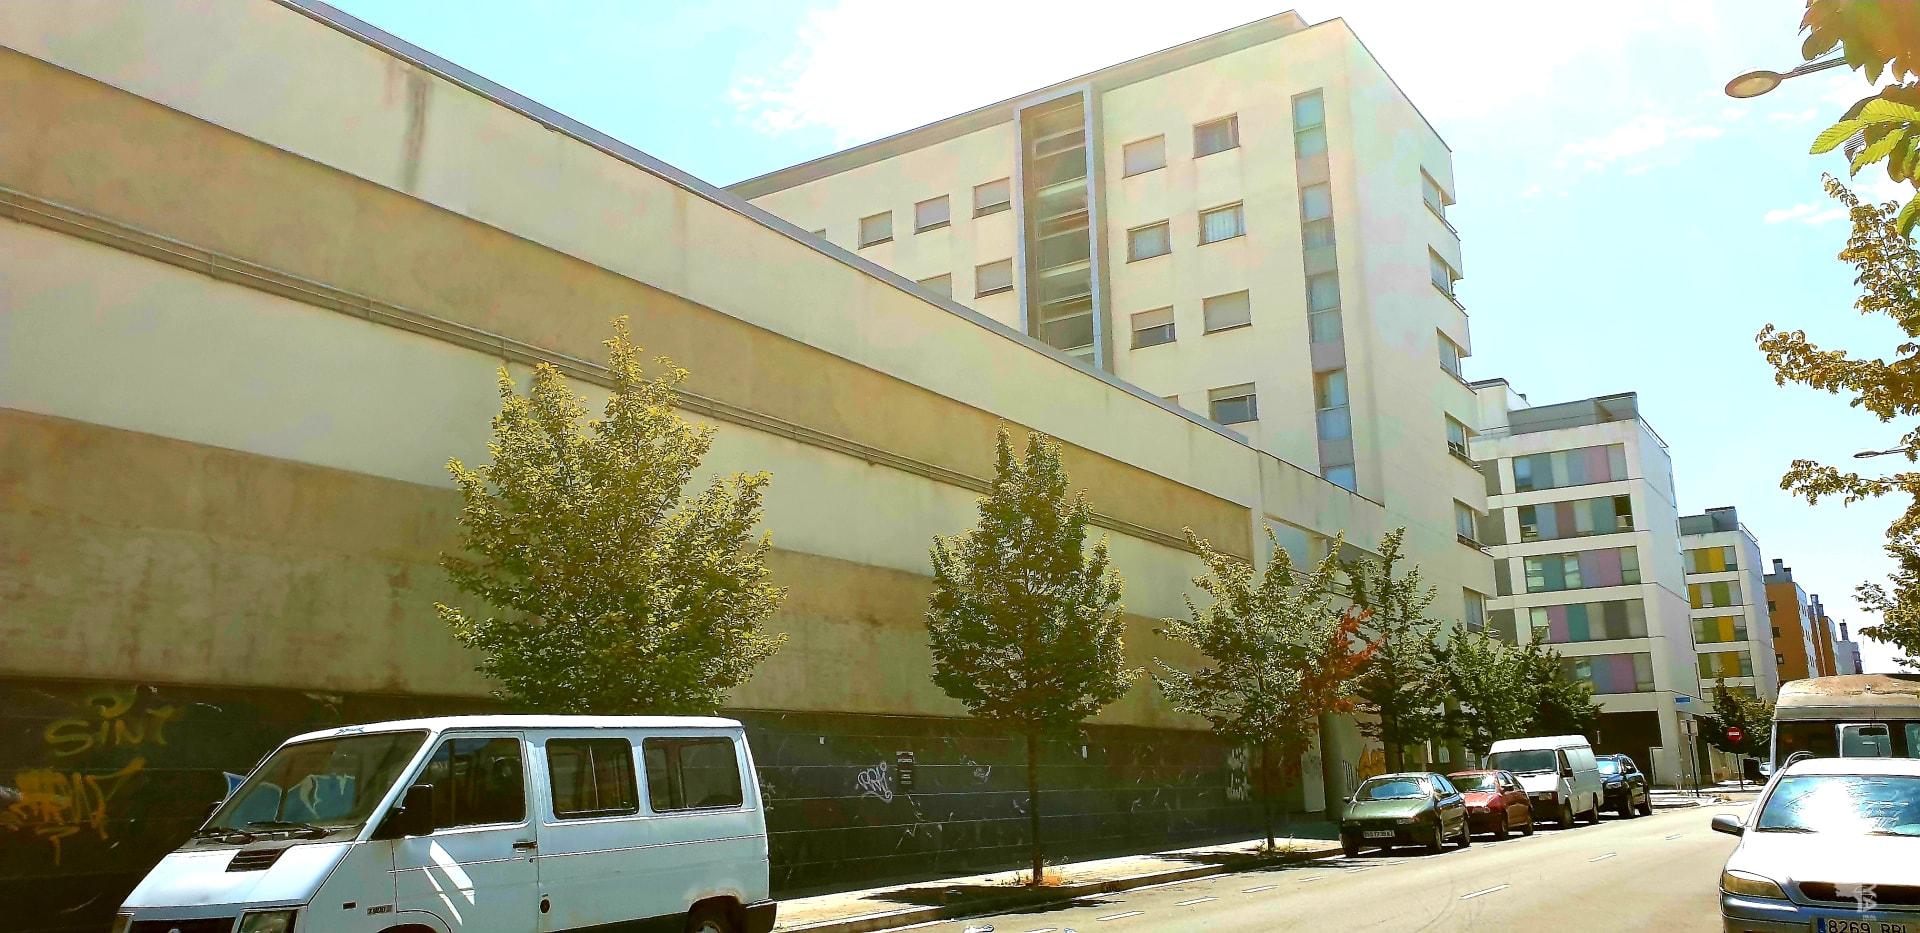 Parking en venta en Salburua, Vitoria-gasteiz, Álava, Calle Viena, 5.800 €, 27 m2